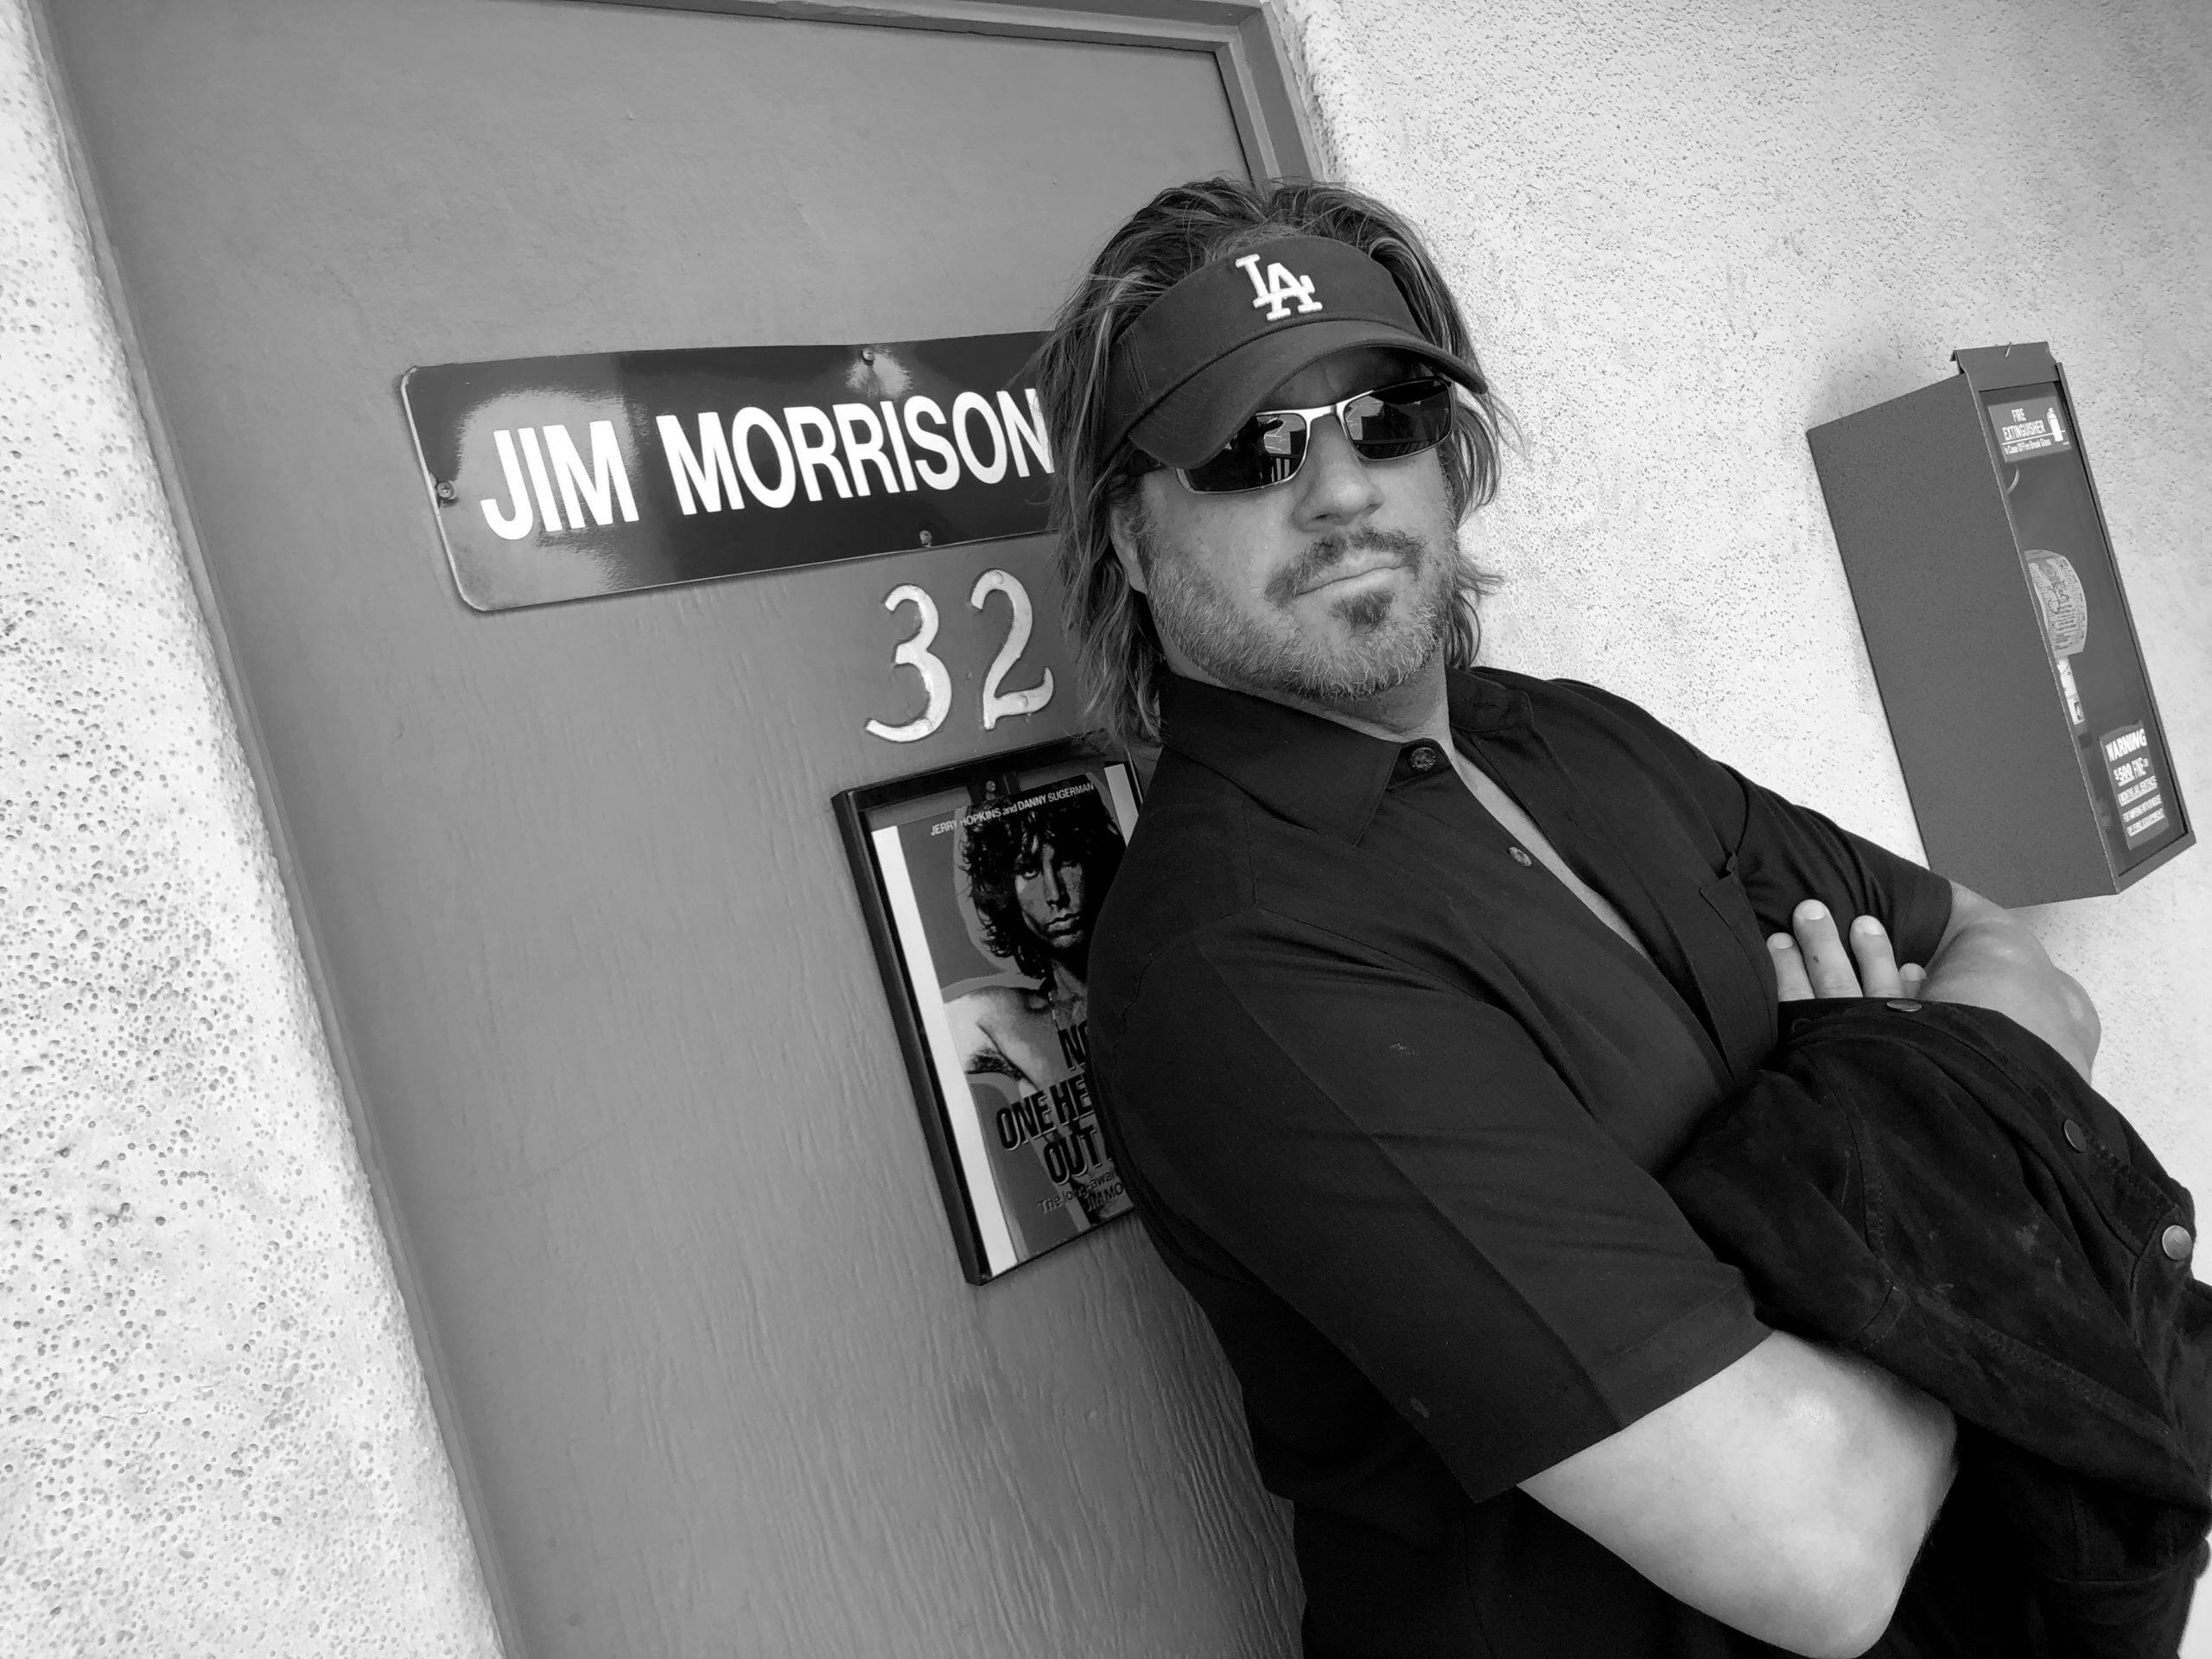 Jon Doscher in front of Jim Morrison sign